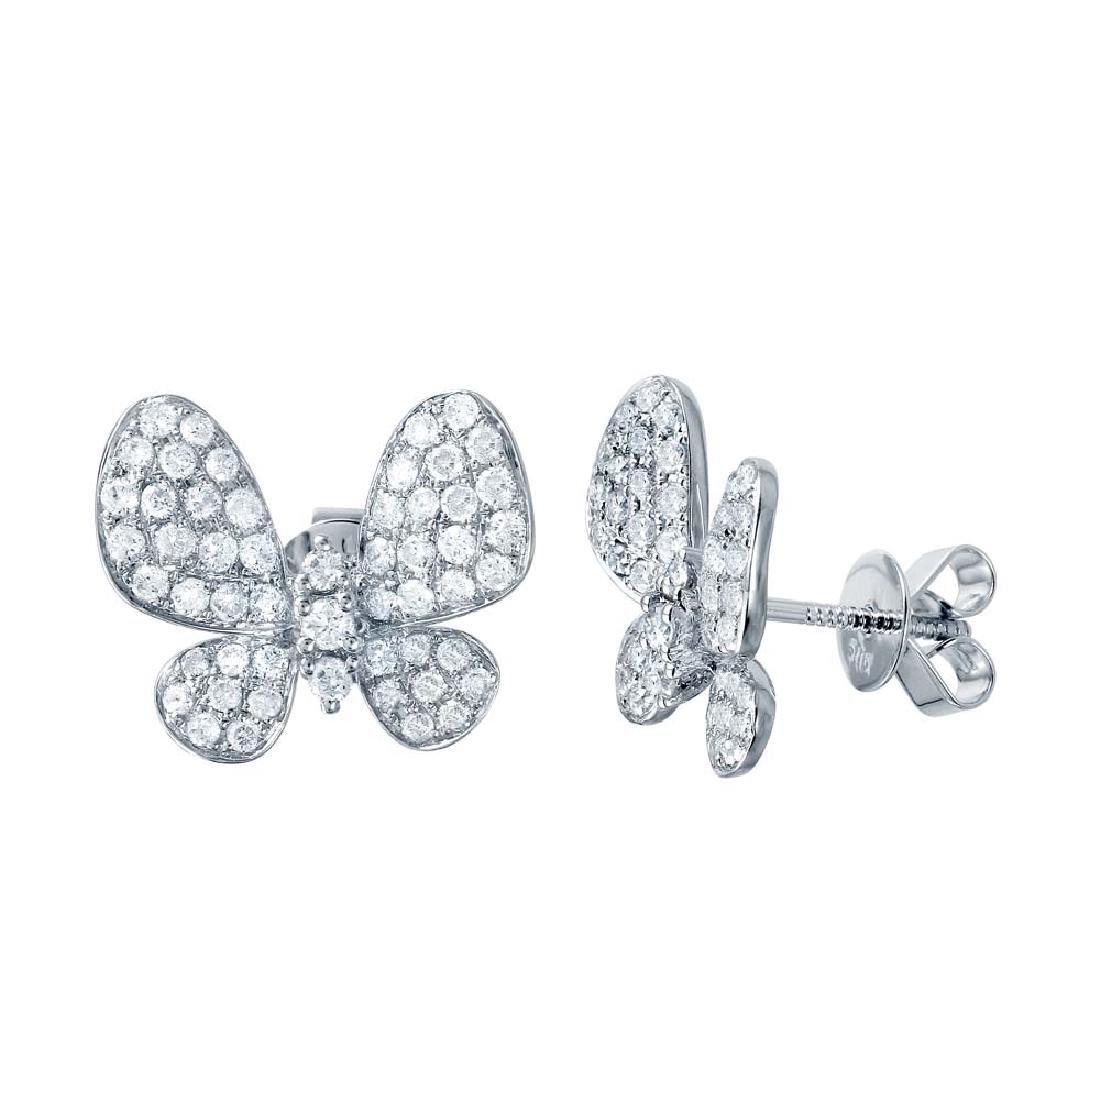 Genuine 1.31 TCW 14K White Gold Ladies Earring